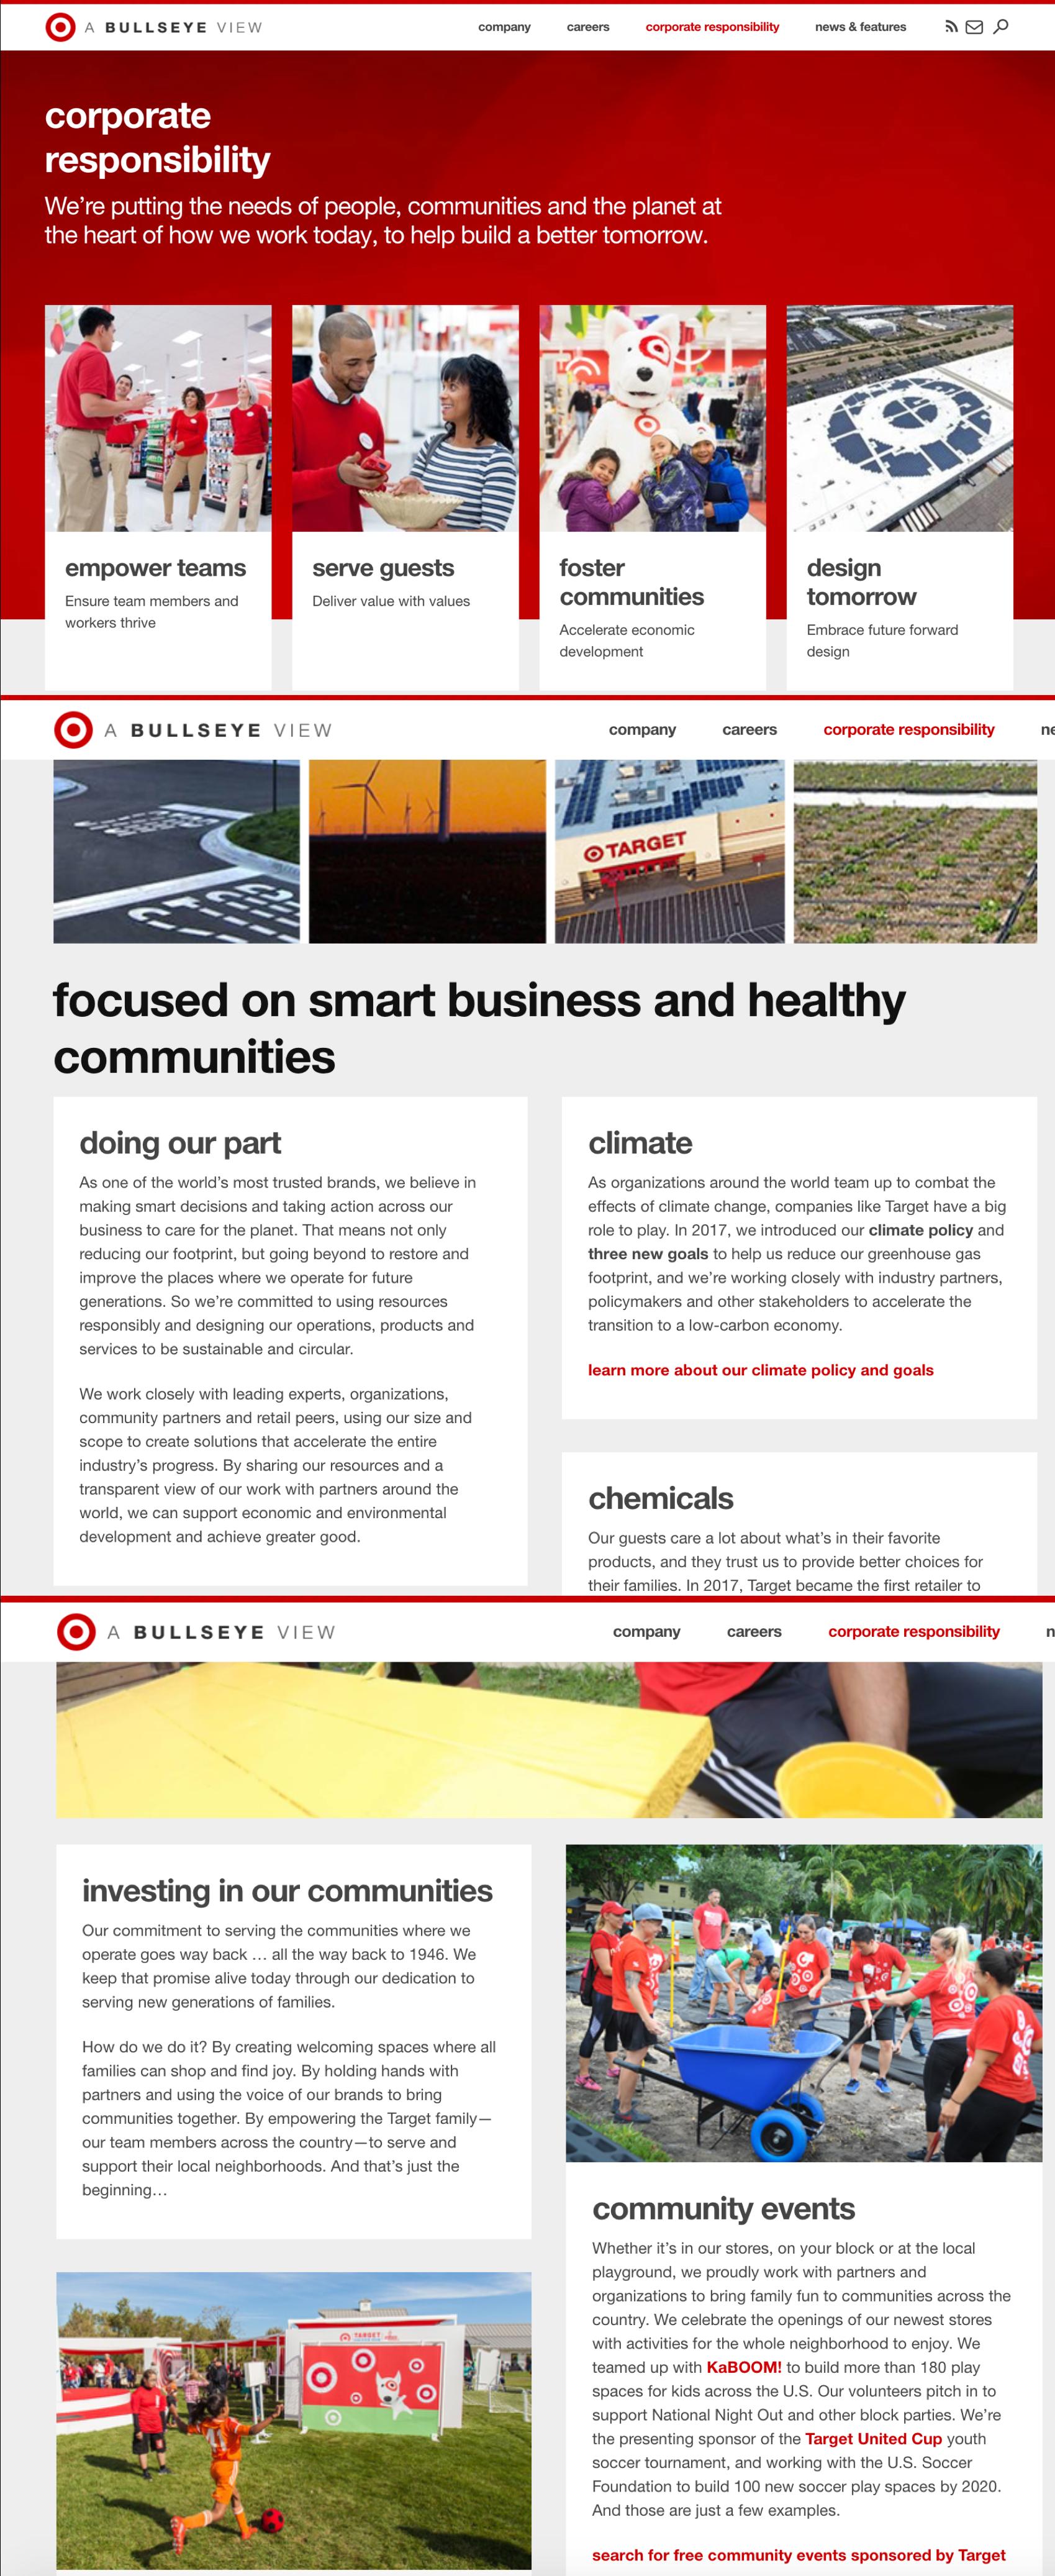 Target CSR Product Communications Strategy (Qual + Quant